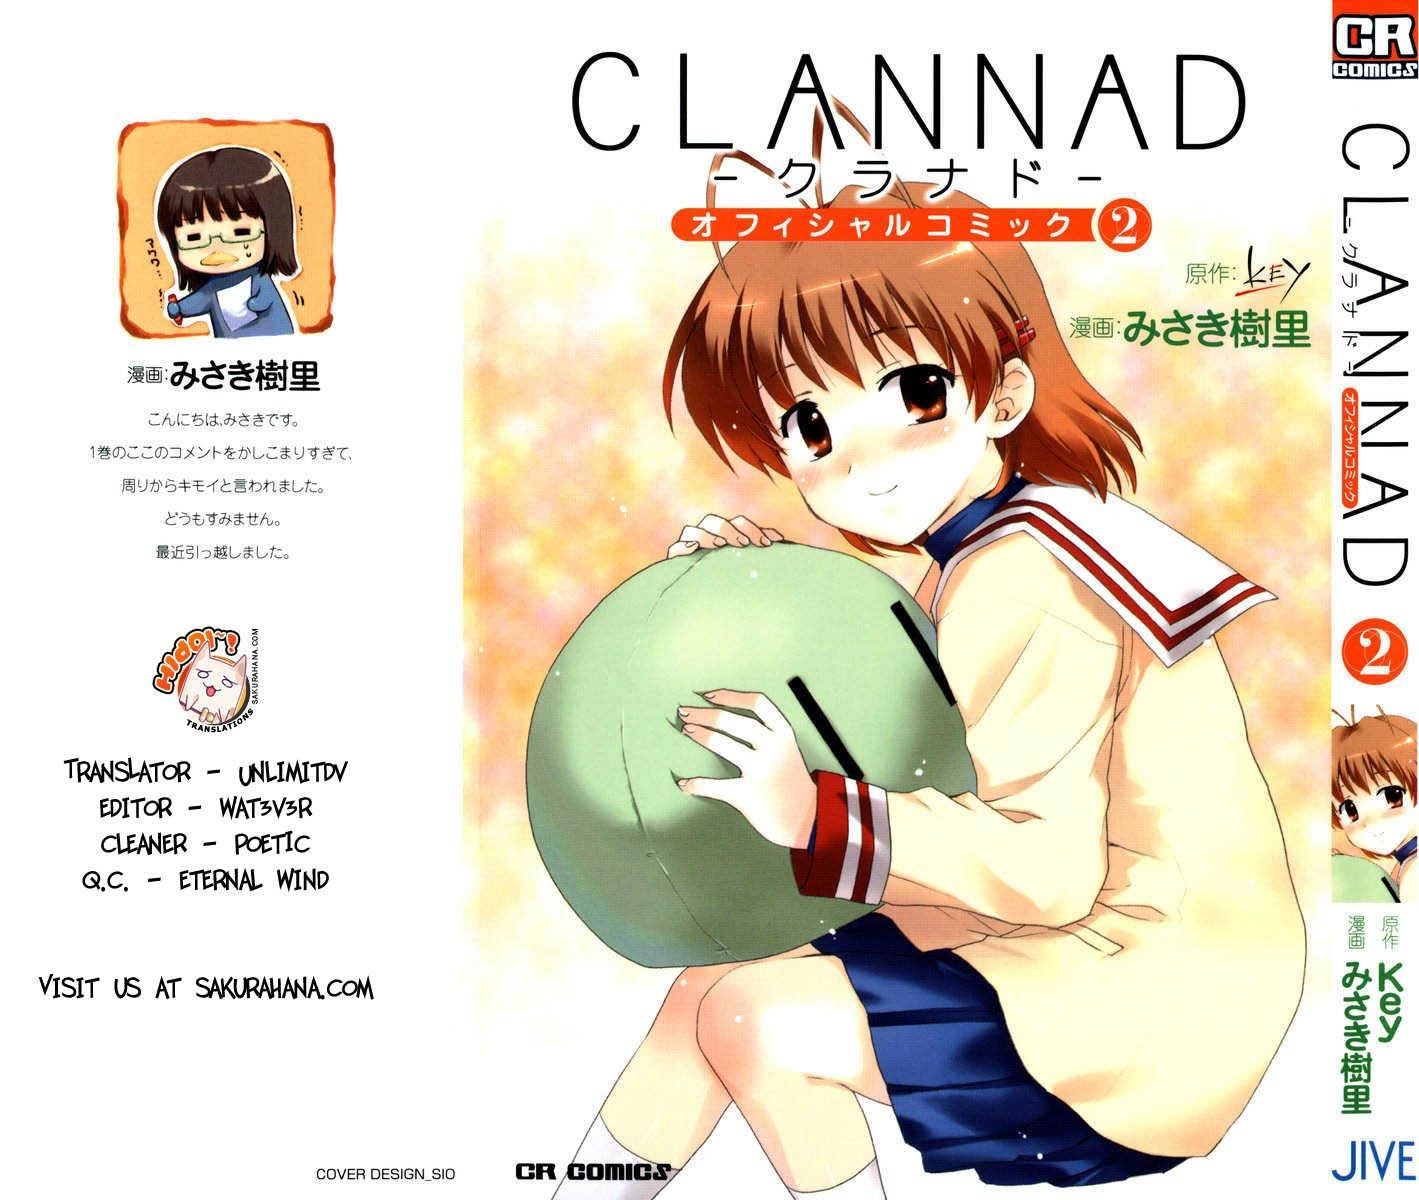 https://im.nineanime.com/comics/pic9/61/3645/83246/Clannad70529.jpg Page 1